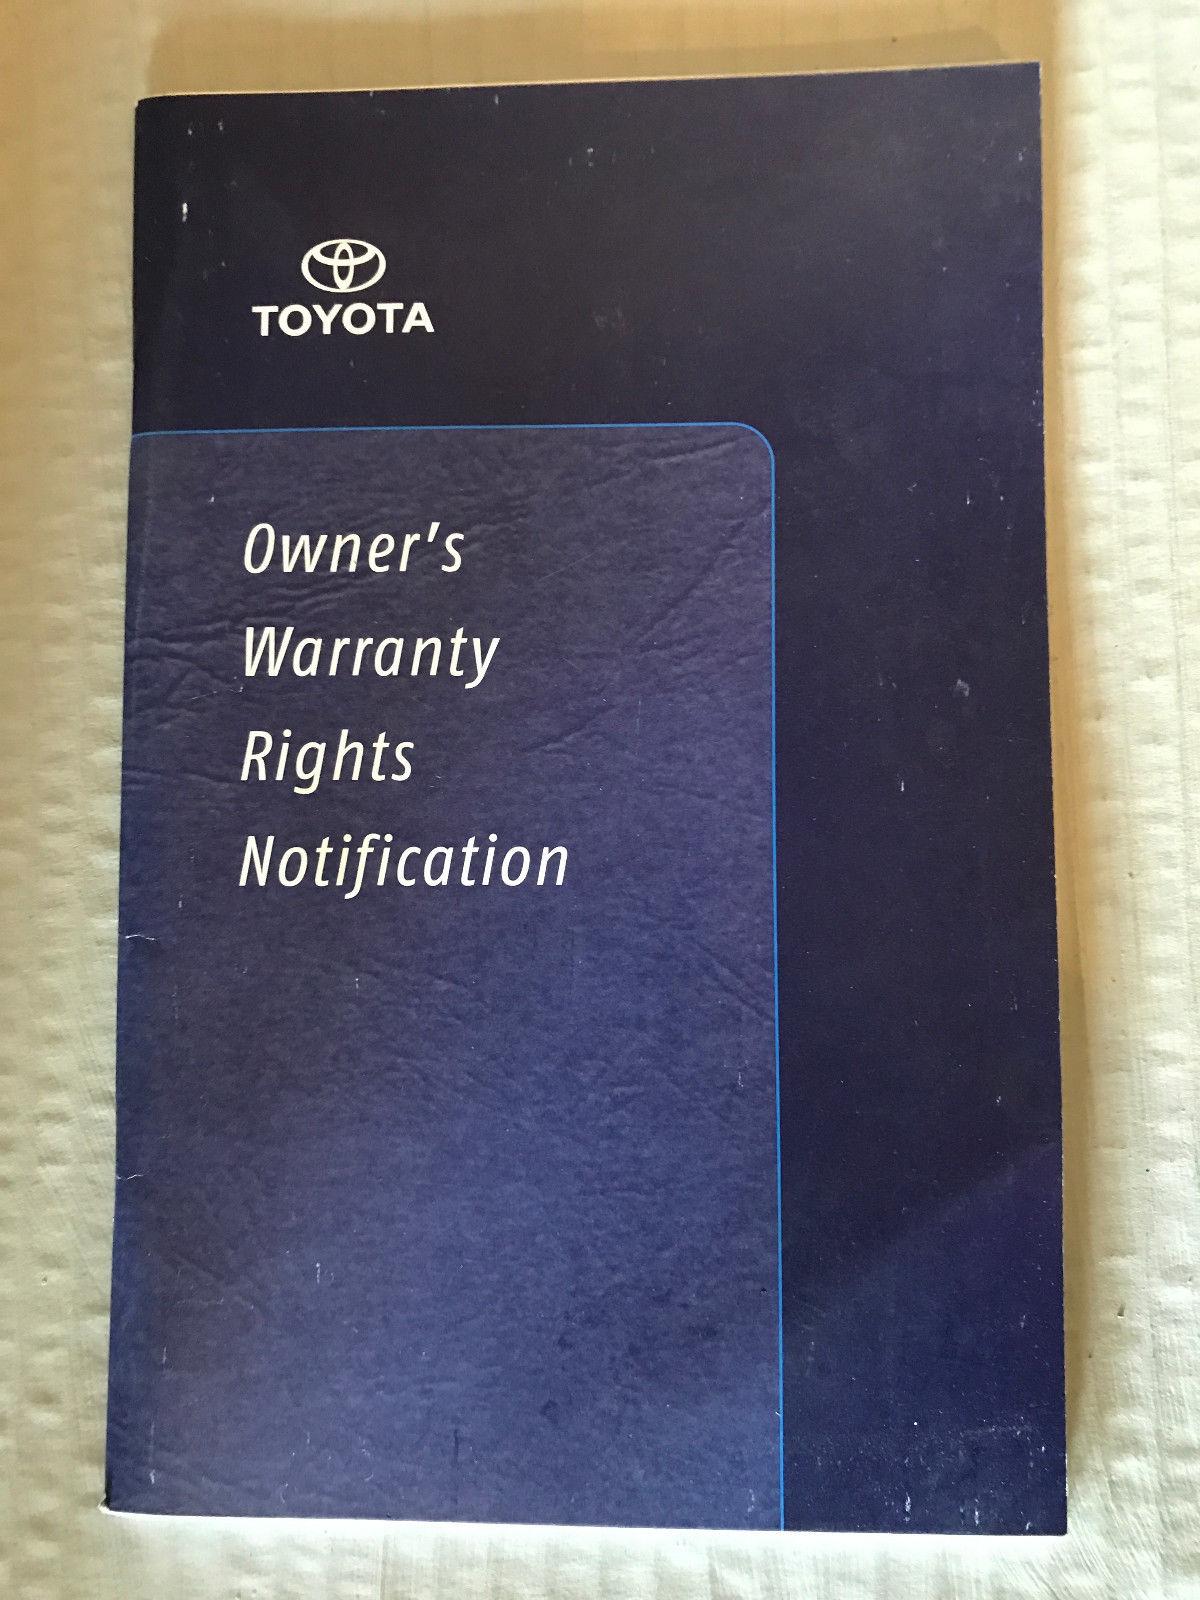 2003 camry maintenance manual